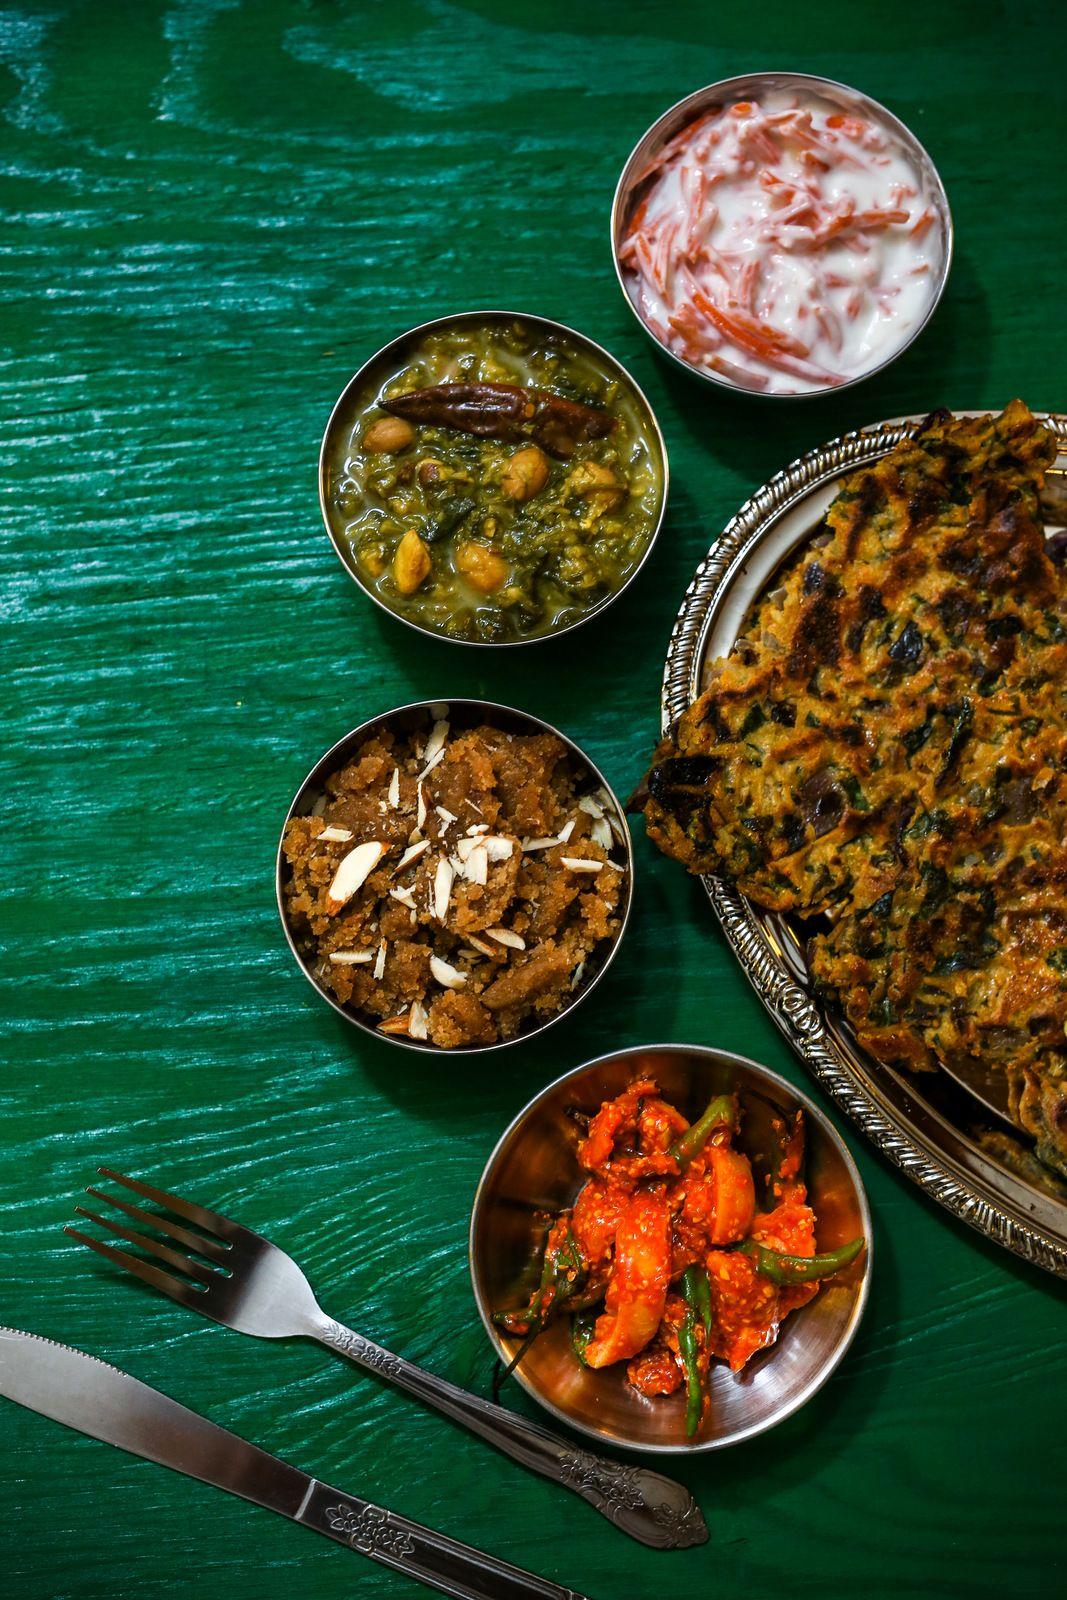 Thalipeeth ghavacha sheera shepuchi bhaji recipe food thalipeeth recipe shepuchi bhaji recipe ghavacha sheera recipe marathi recipes marathi food easy recipes indian recipes how to make thalipeeth food forumfinder Choice Image